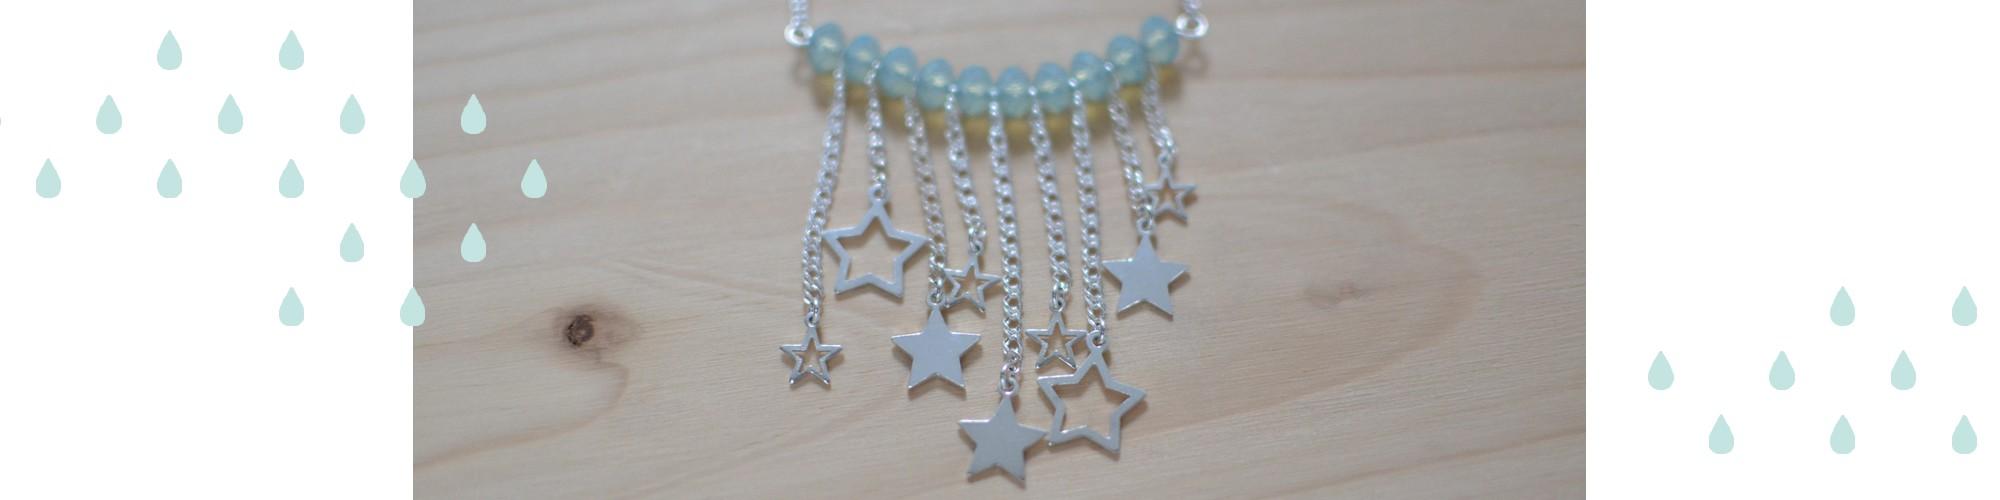 Sautoir étoiles filantes en argent 925 #BDJ139